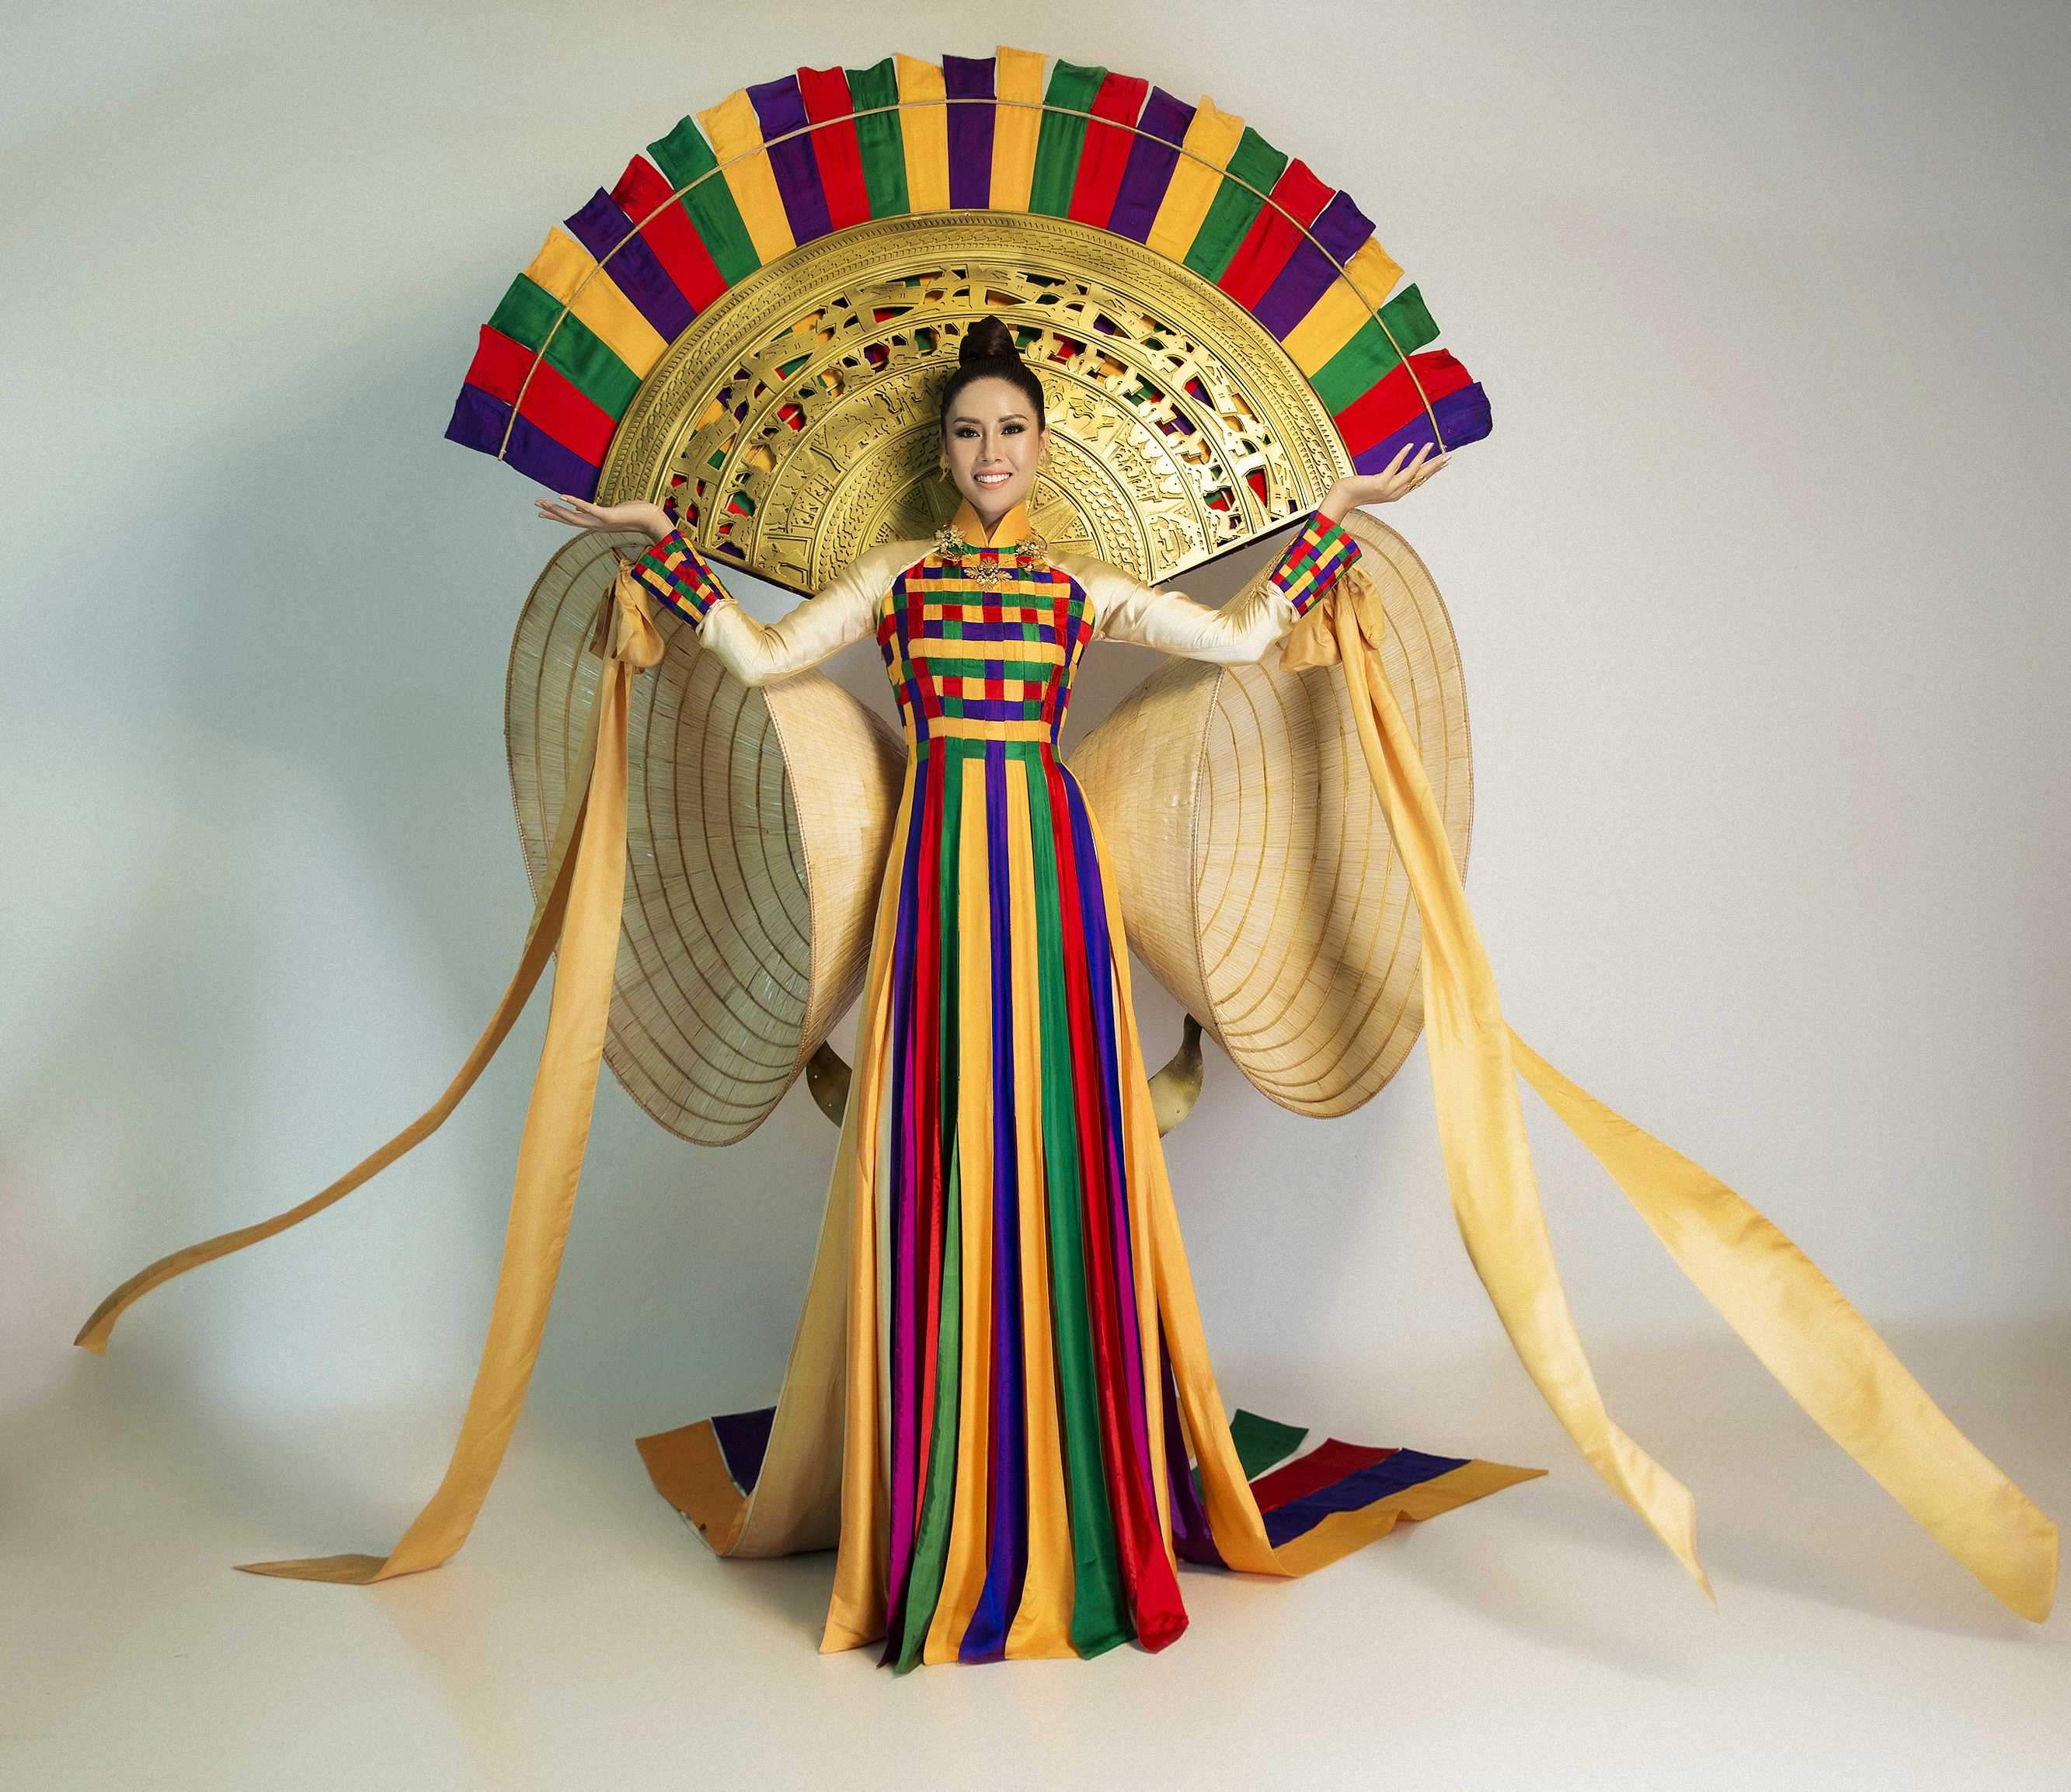 Nguyen Thi Loan_national costume Miss Universe 2017